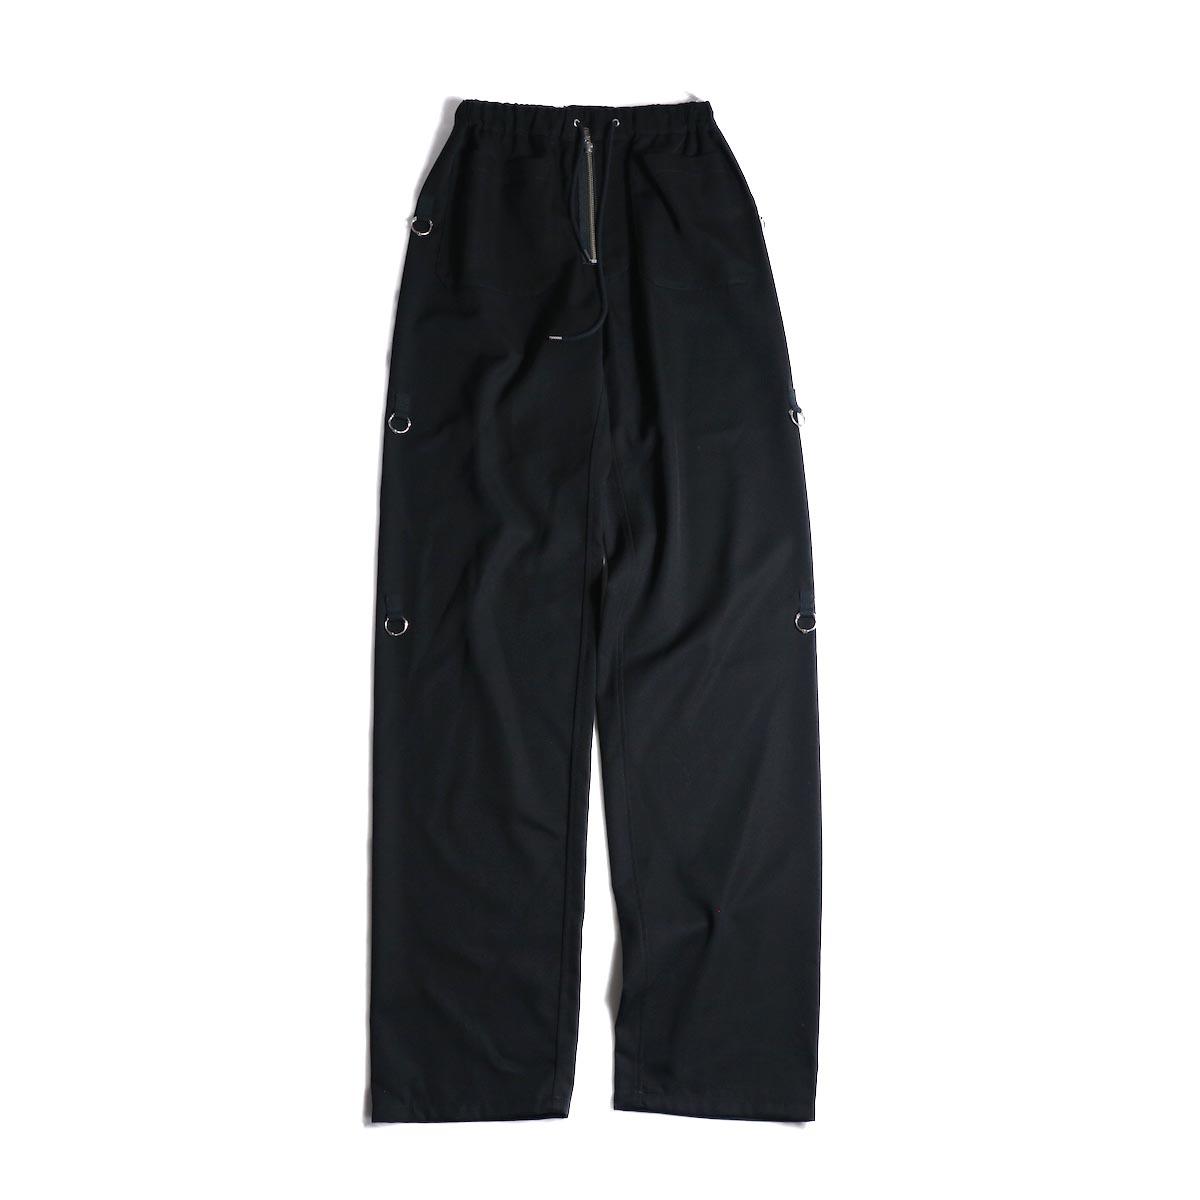 The Soloist / sp.0004dAW20 pajama pant.